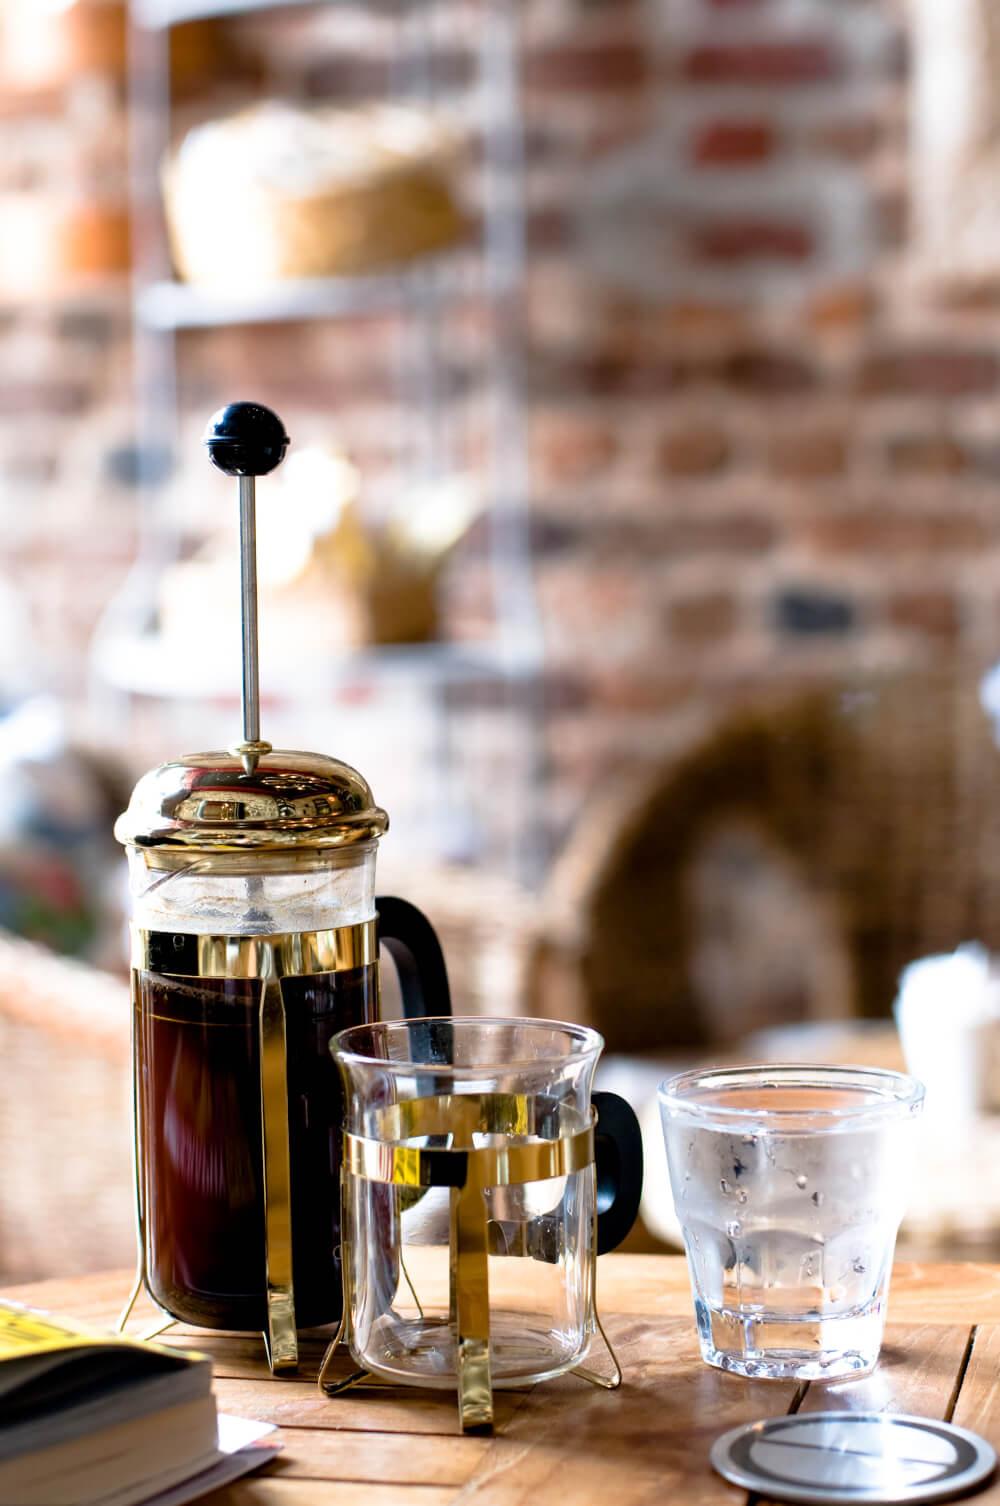 french-press-kaffee-glas-wasser